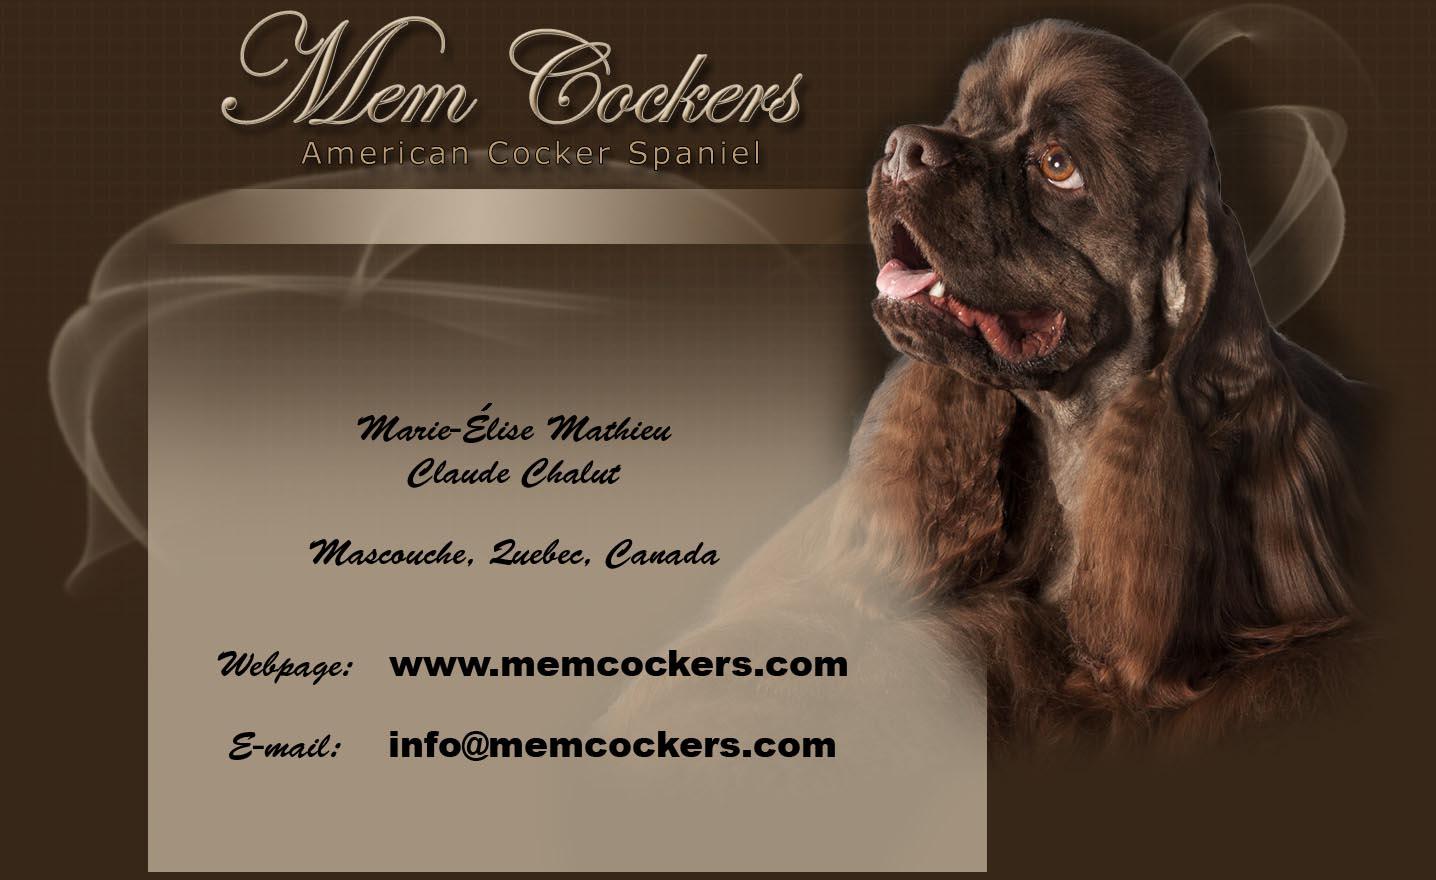 Cockerspaniel Online Magazine Breeders Quebec Canada